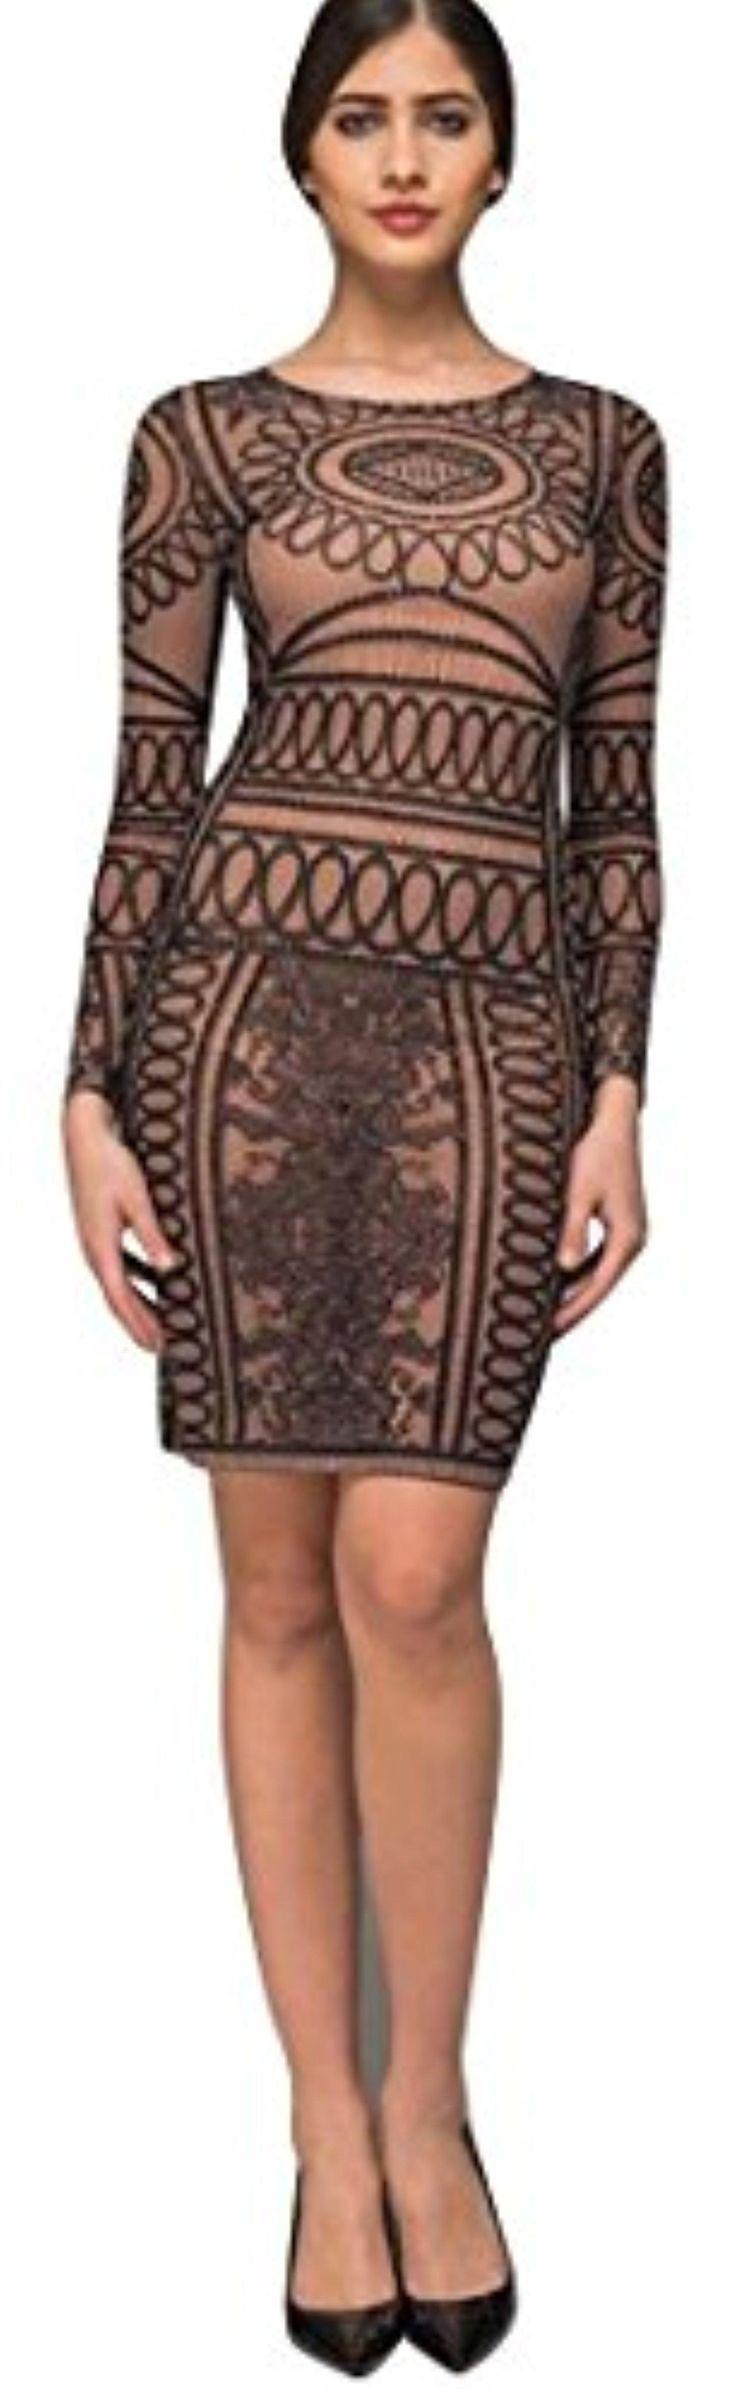 Kiki Riki Women's Semi-Sheer Rhinestone Patterned Short Dress - Brought to you by Avarsha.com